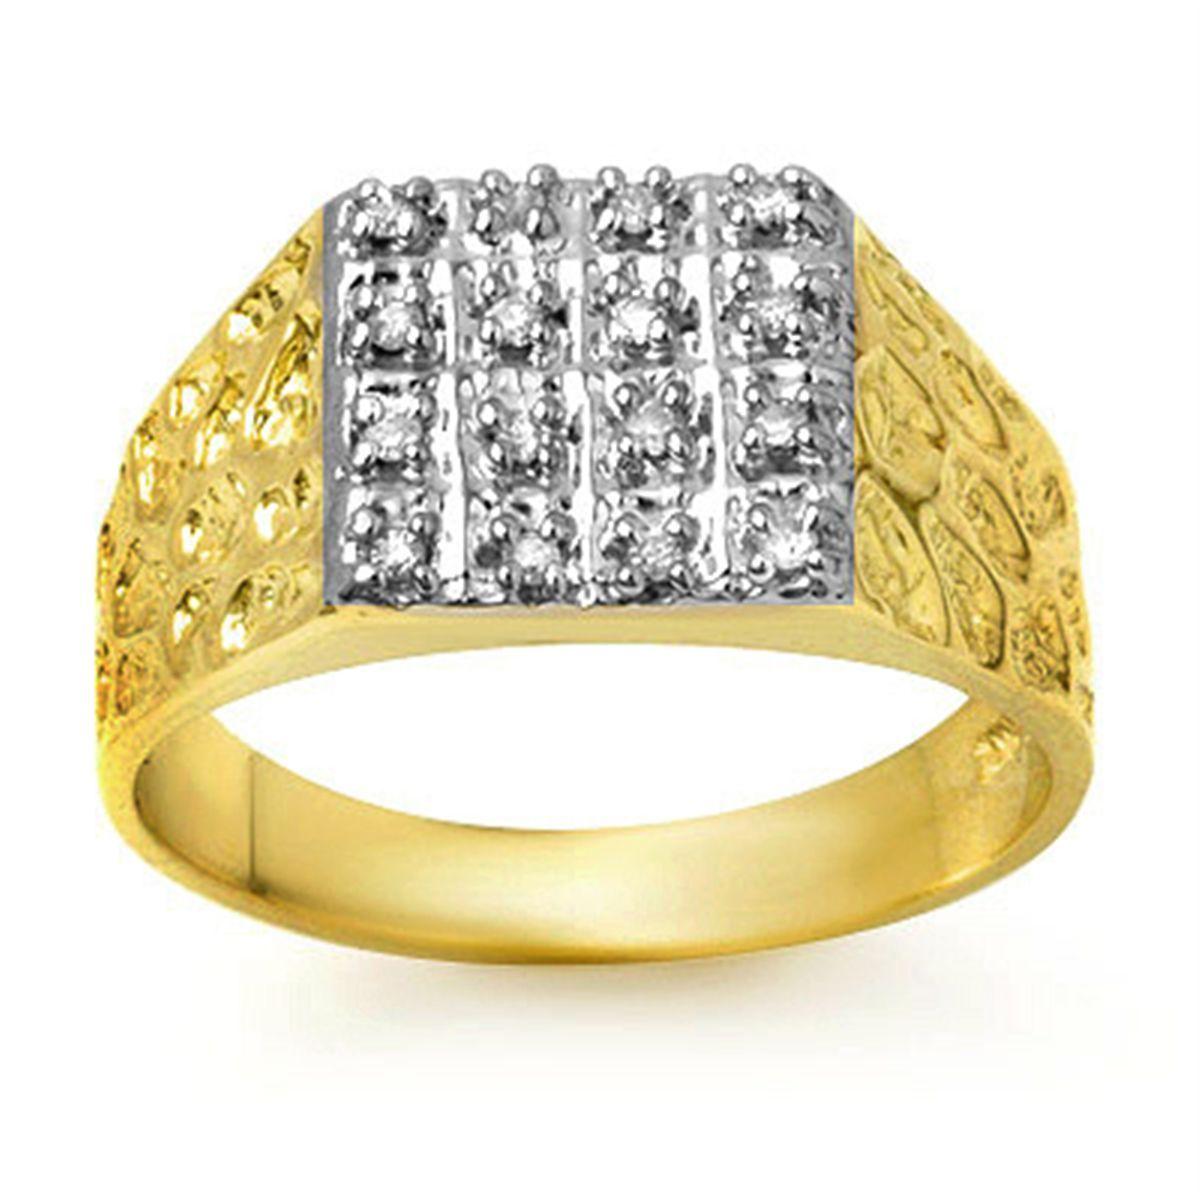 mens gold diamond ring - Google Search | rings | Pinterest | Gold ...